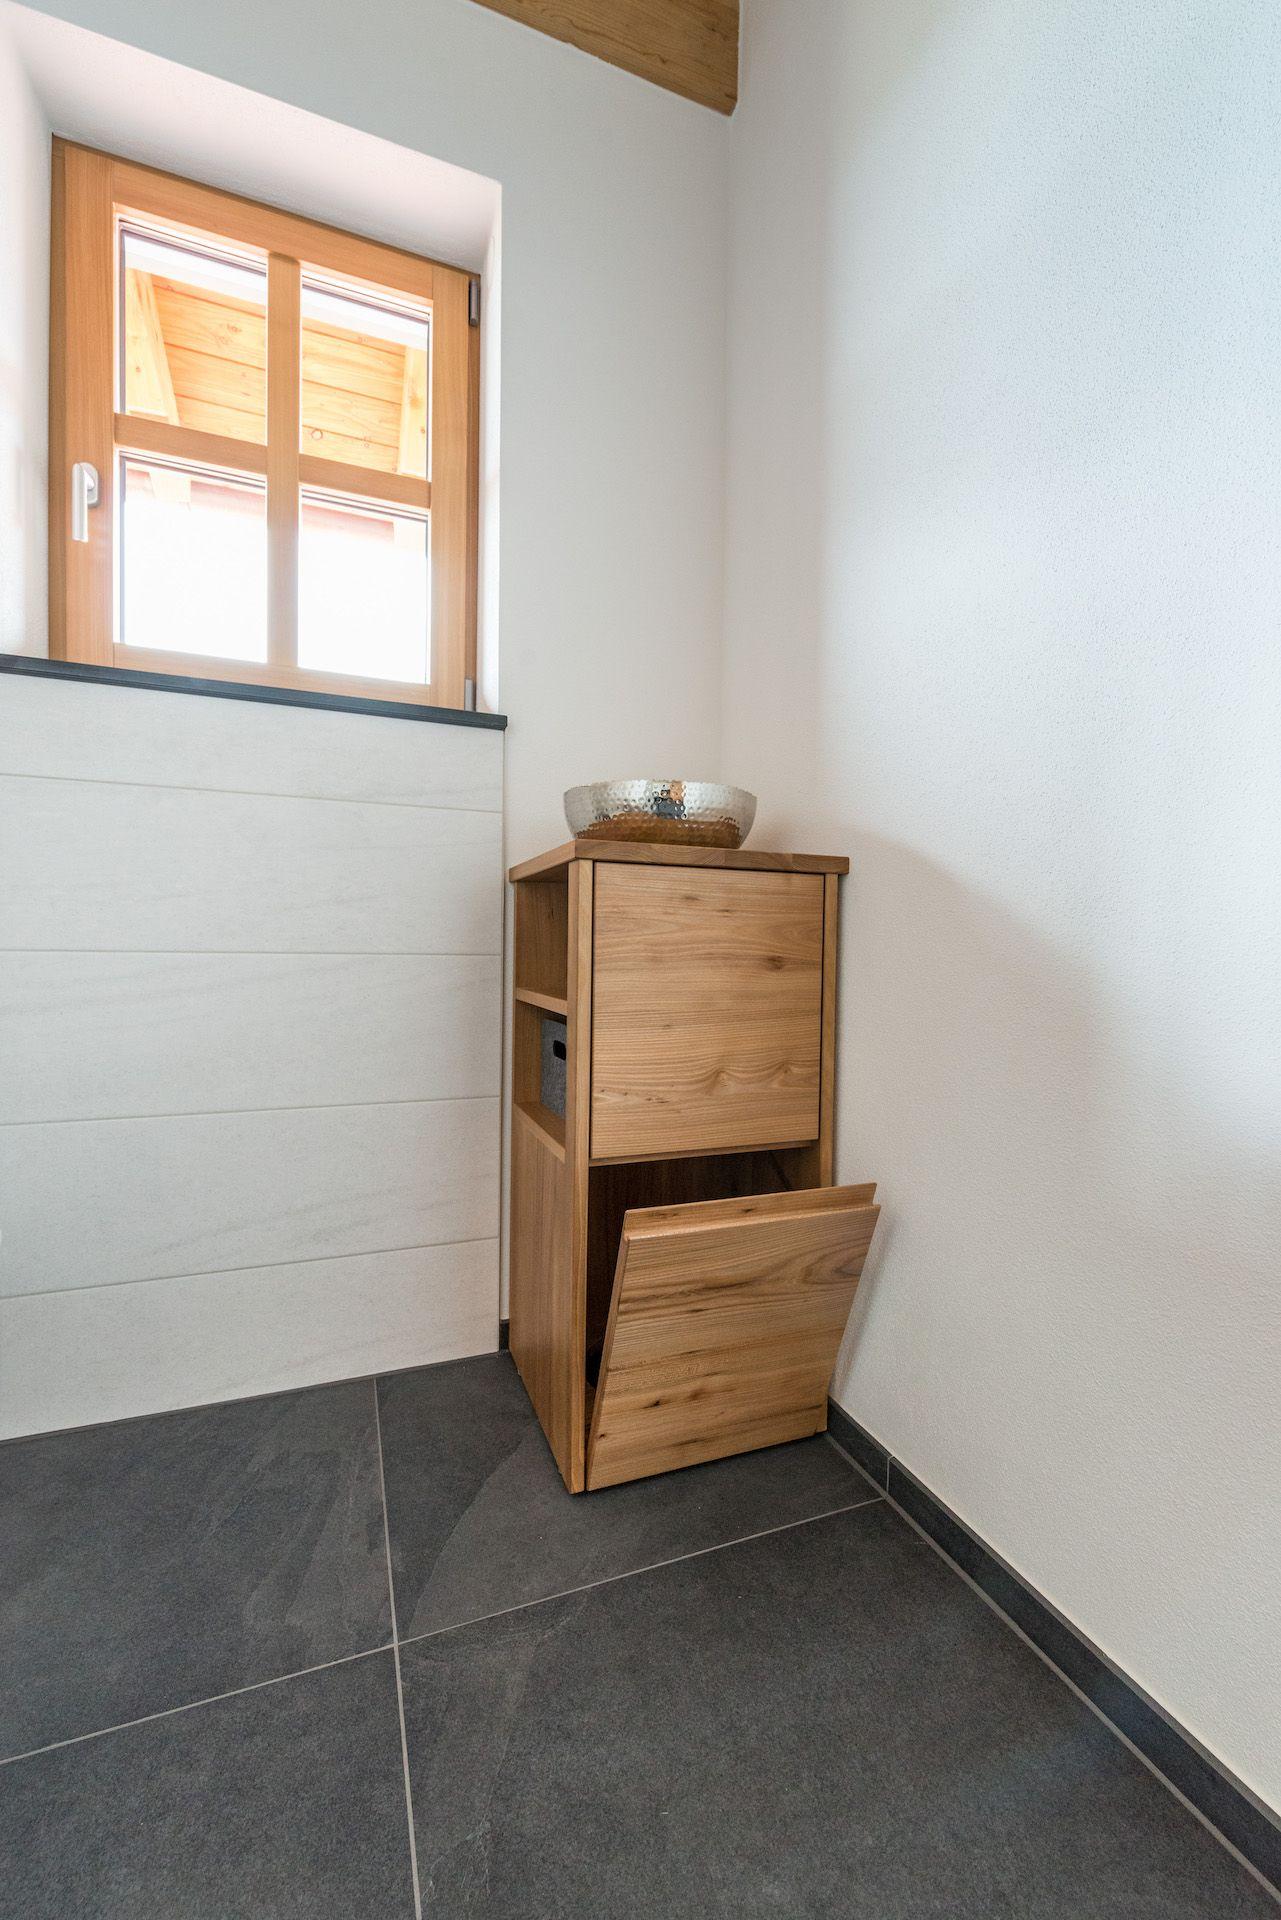 Wäscheschacht #bathroomlaundry